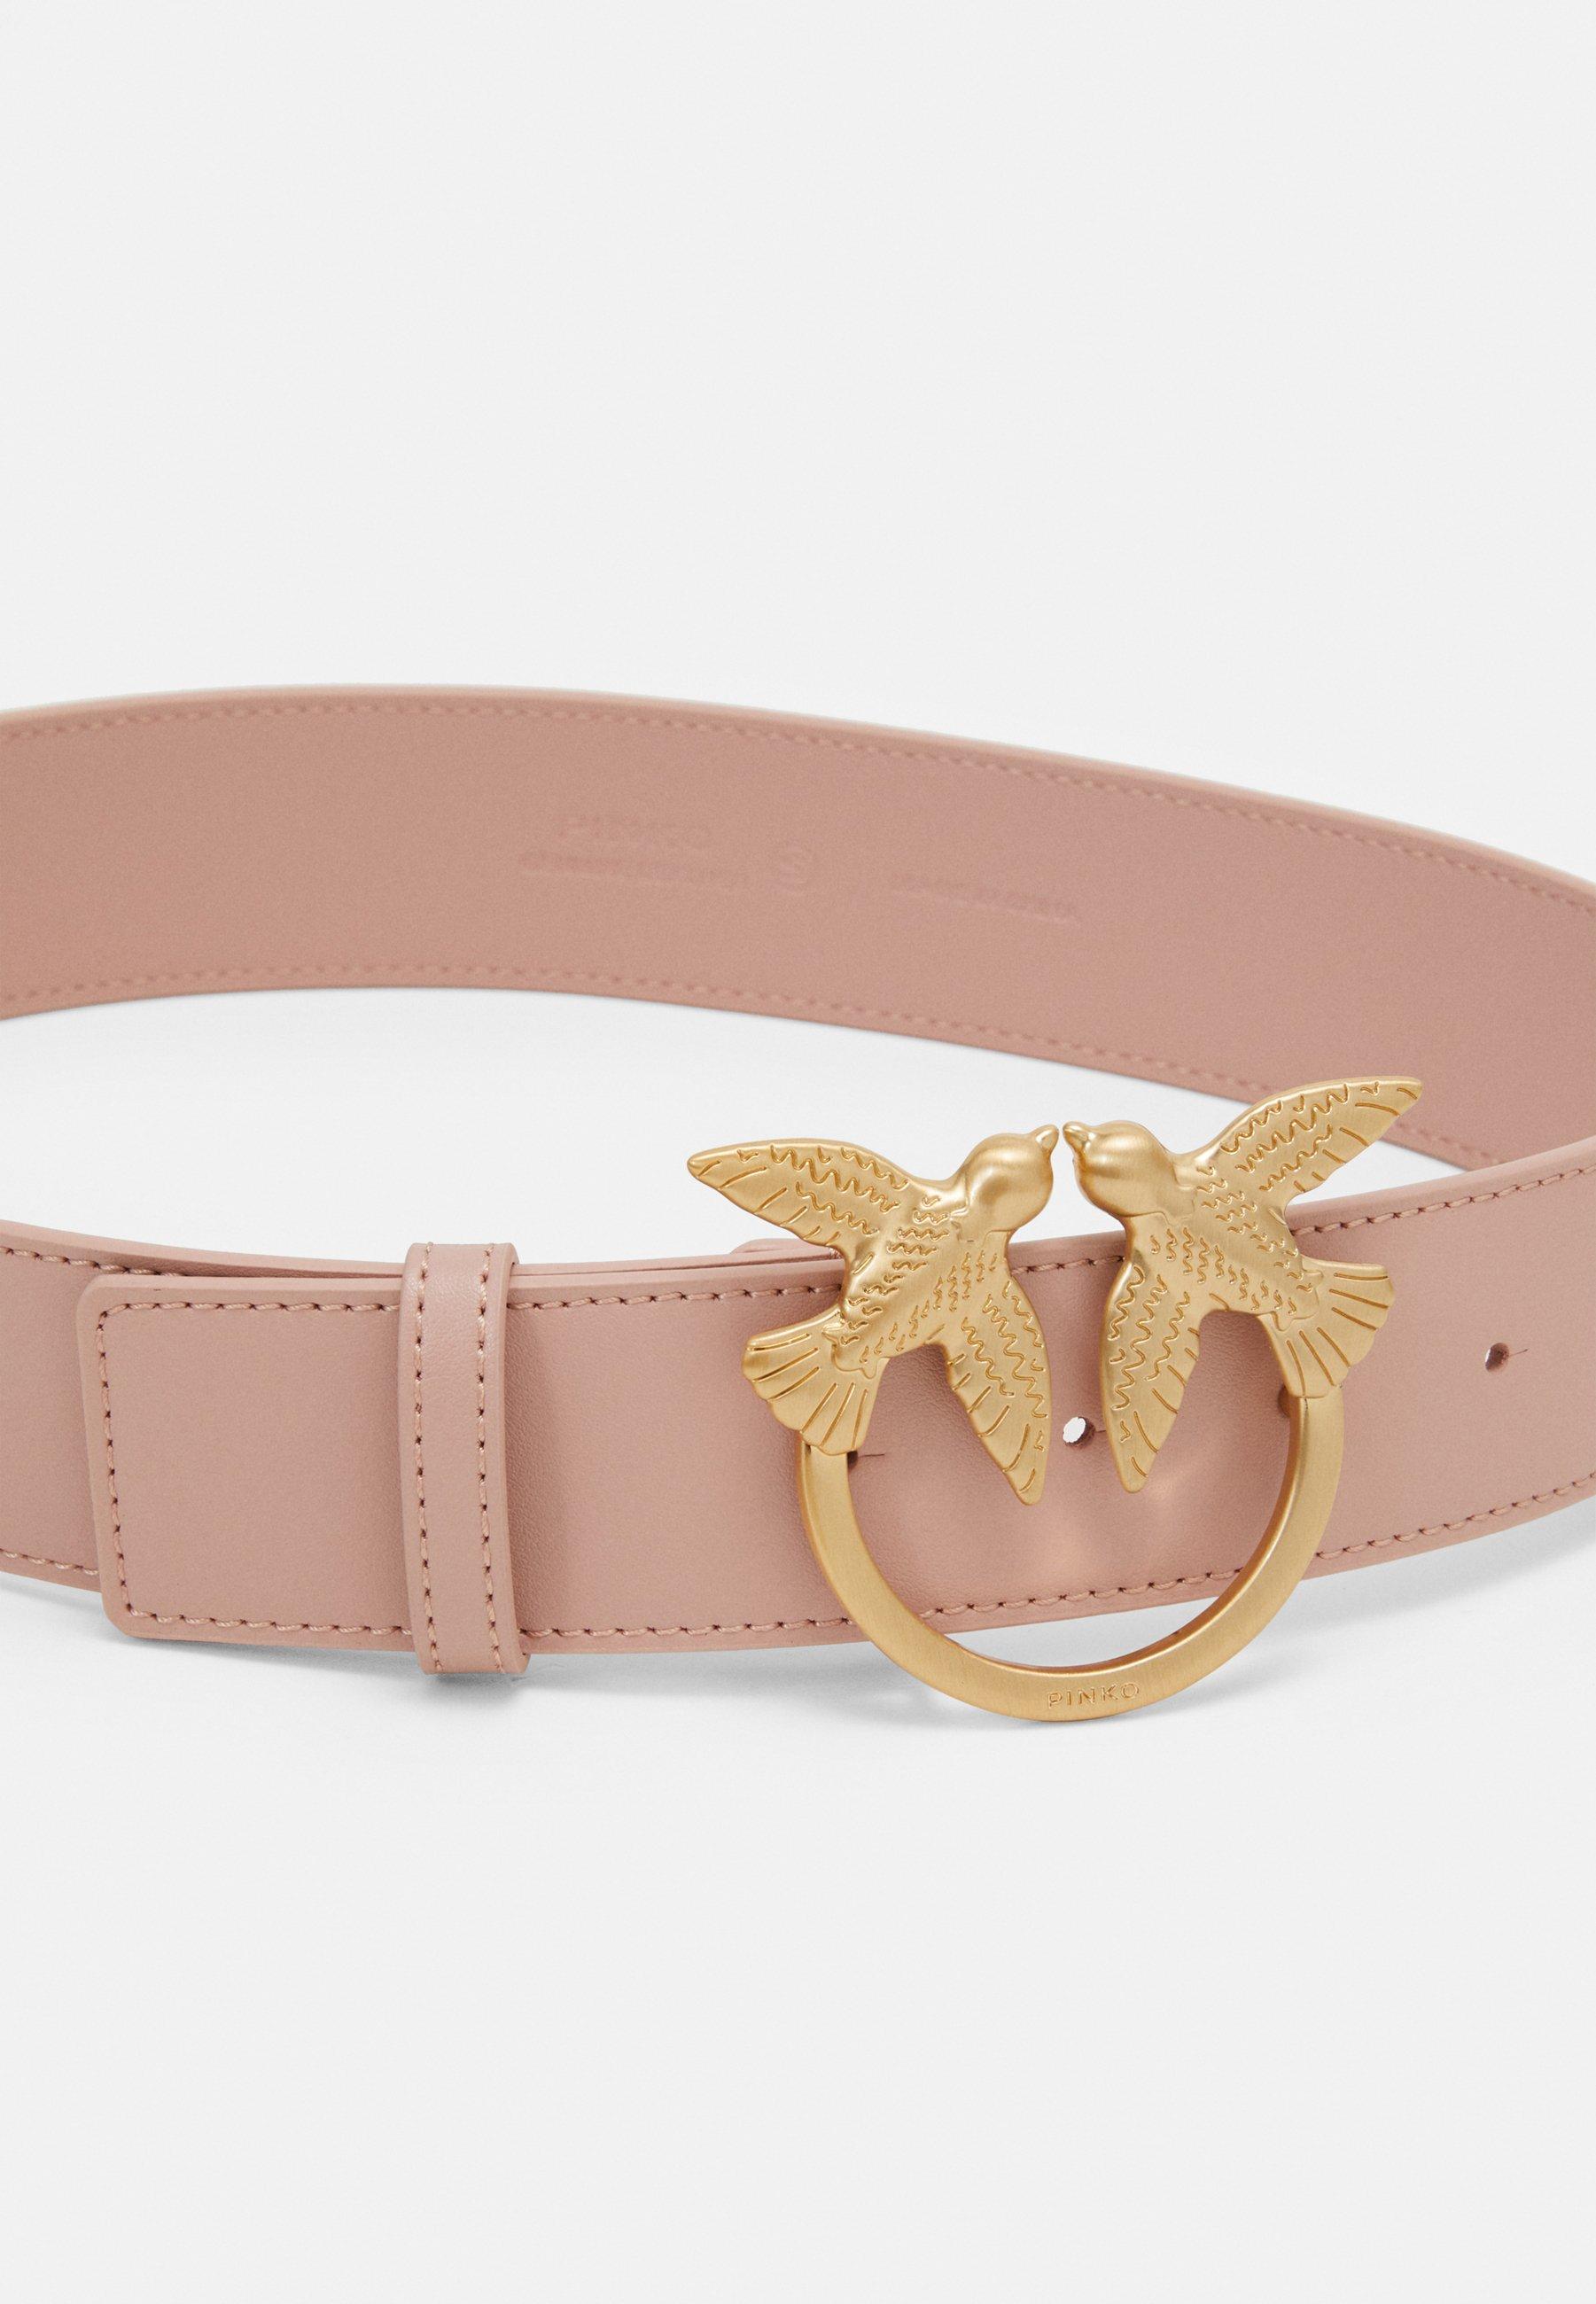 Pinko BERRY SIMPLY BELT - Belte - light pink/lyserosa 9D7t4haEr51XQsJ